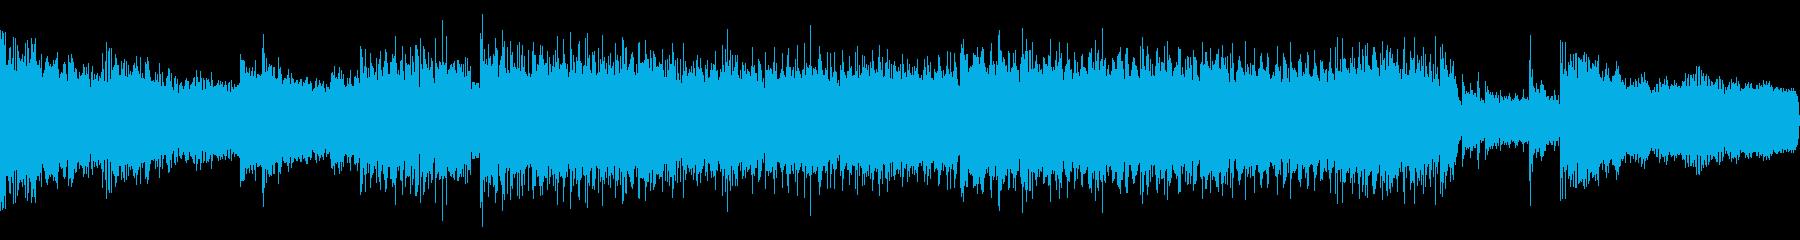 Duelist 30秒の再生済みの波形